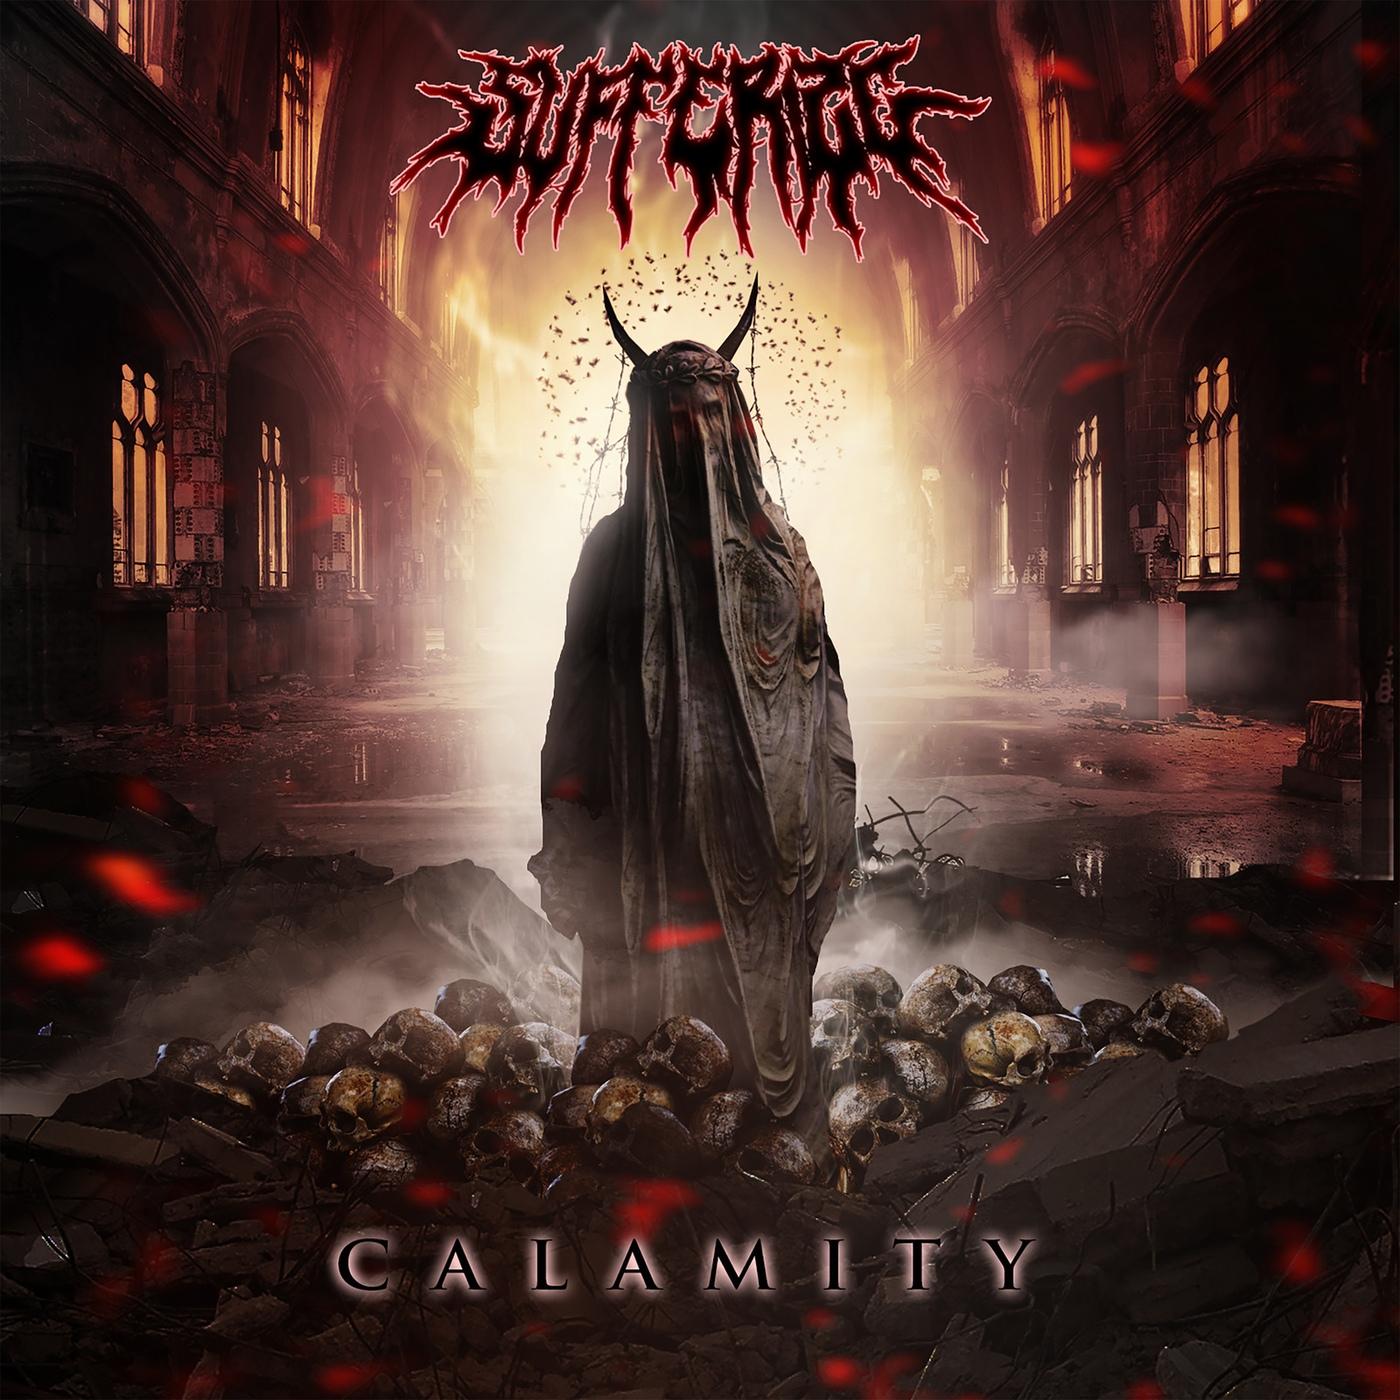 Sufferize - Calamity (2020)